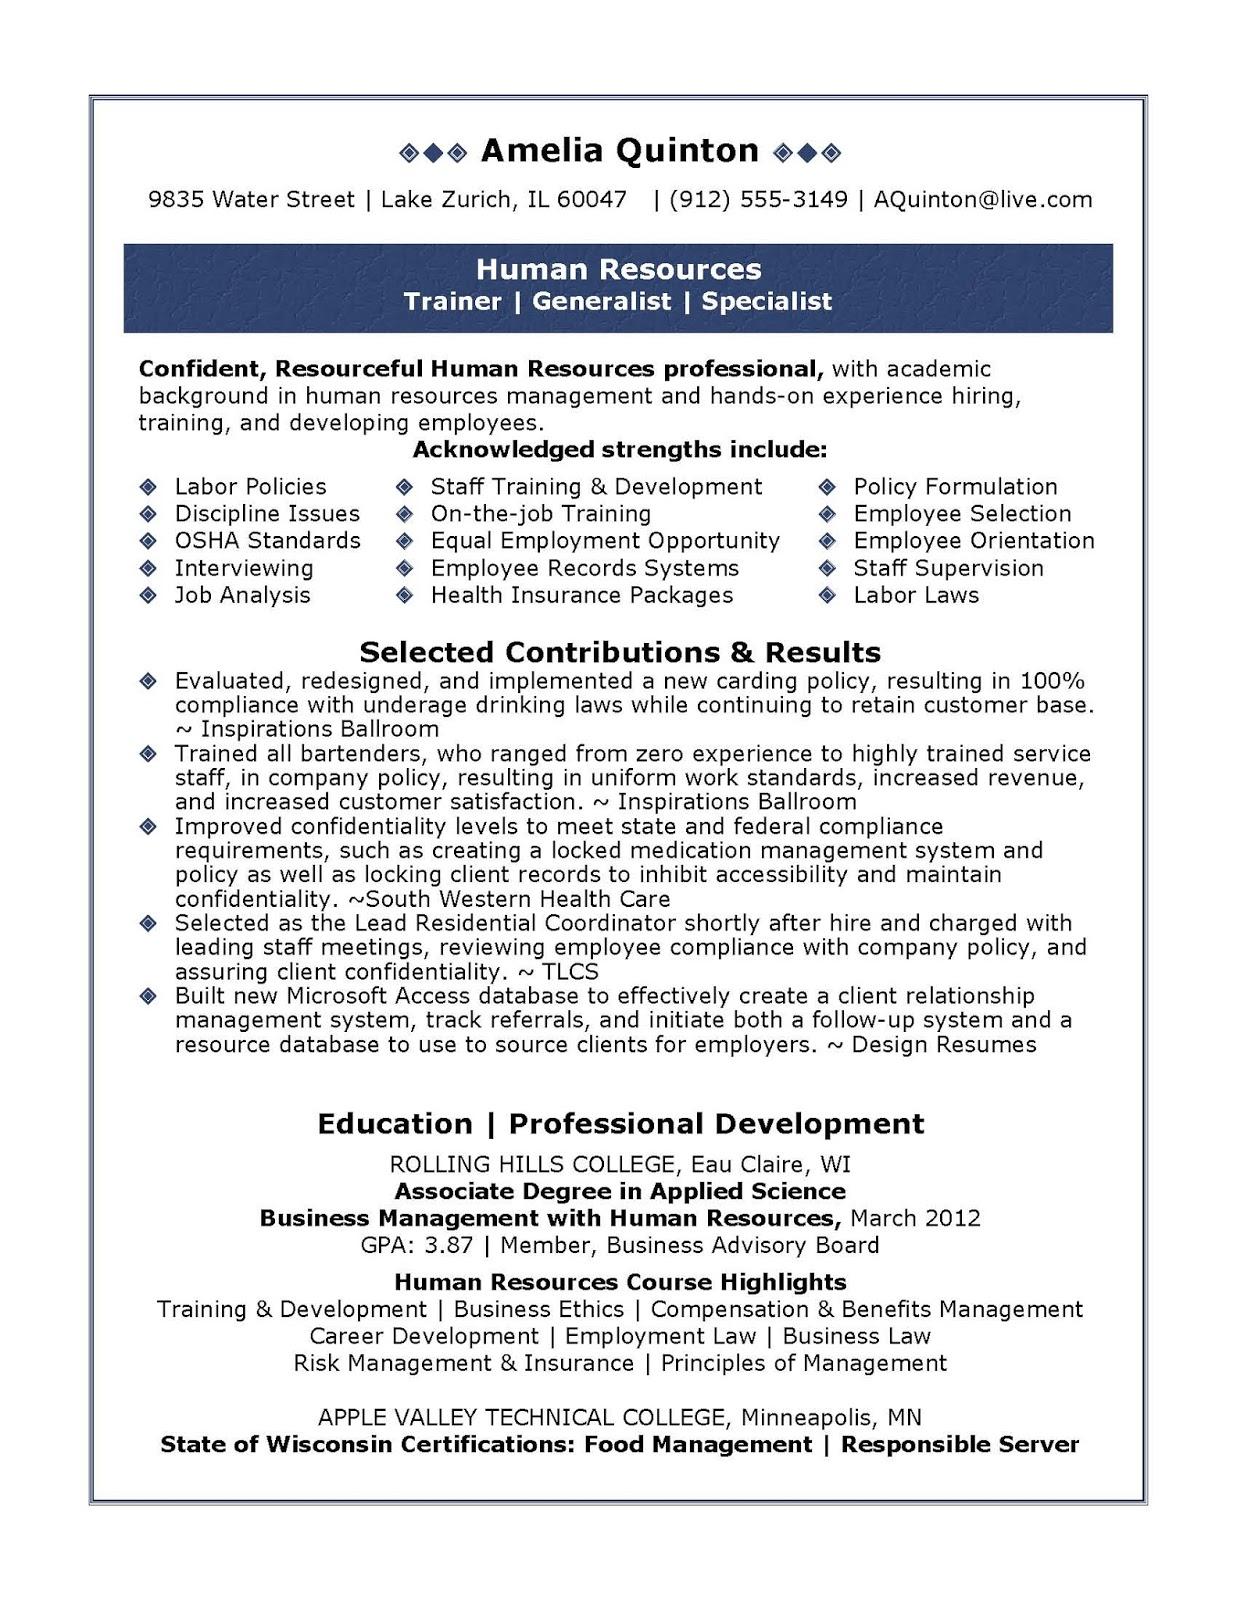 human resources sample resume